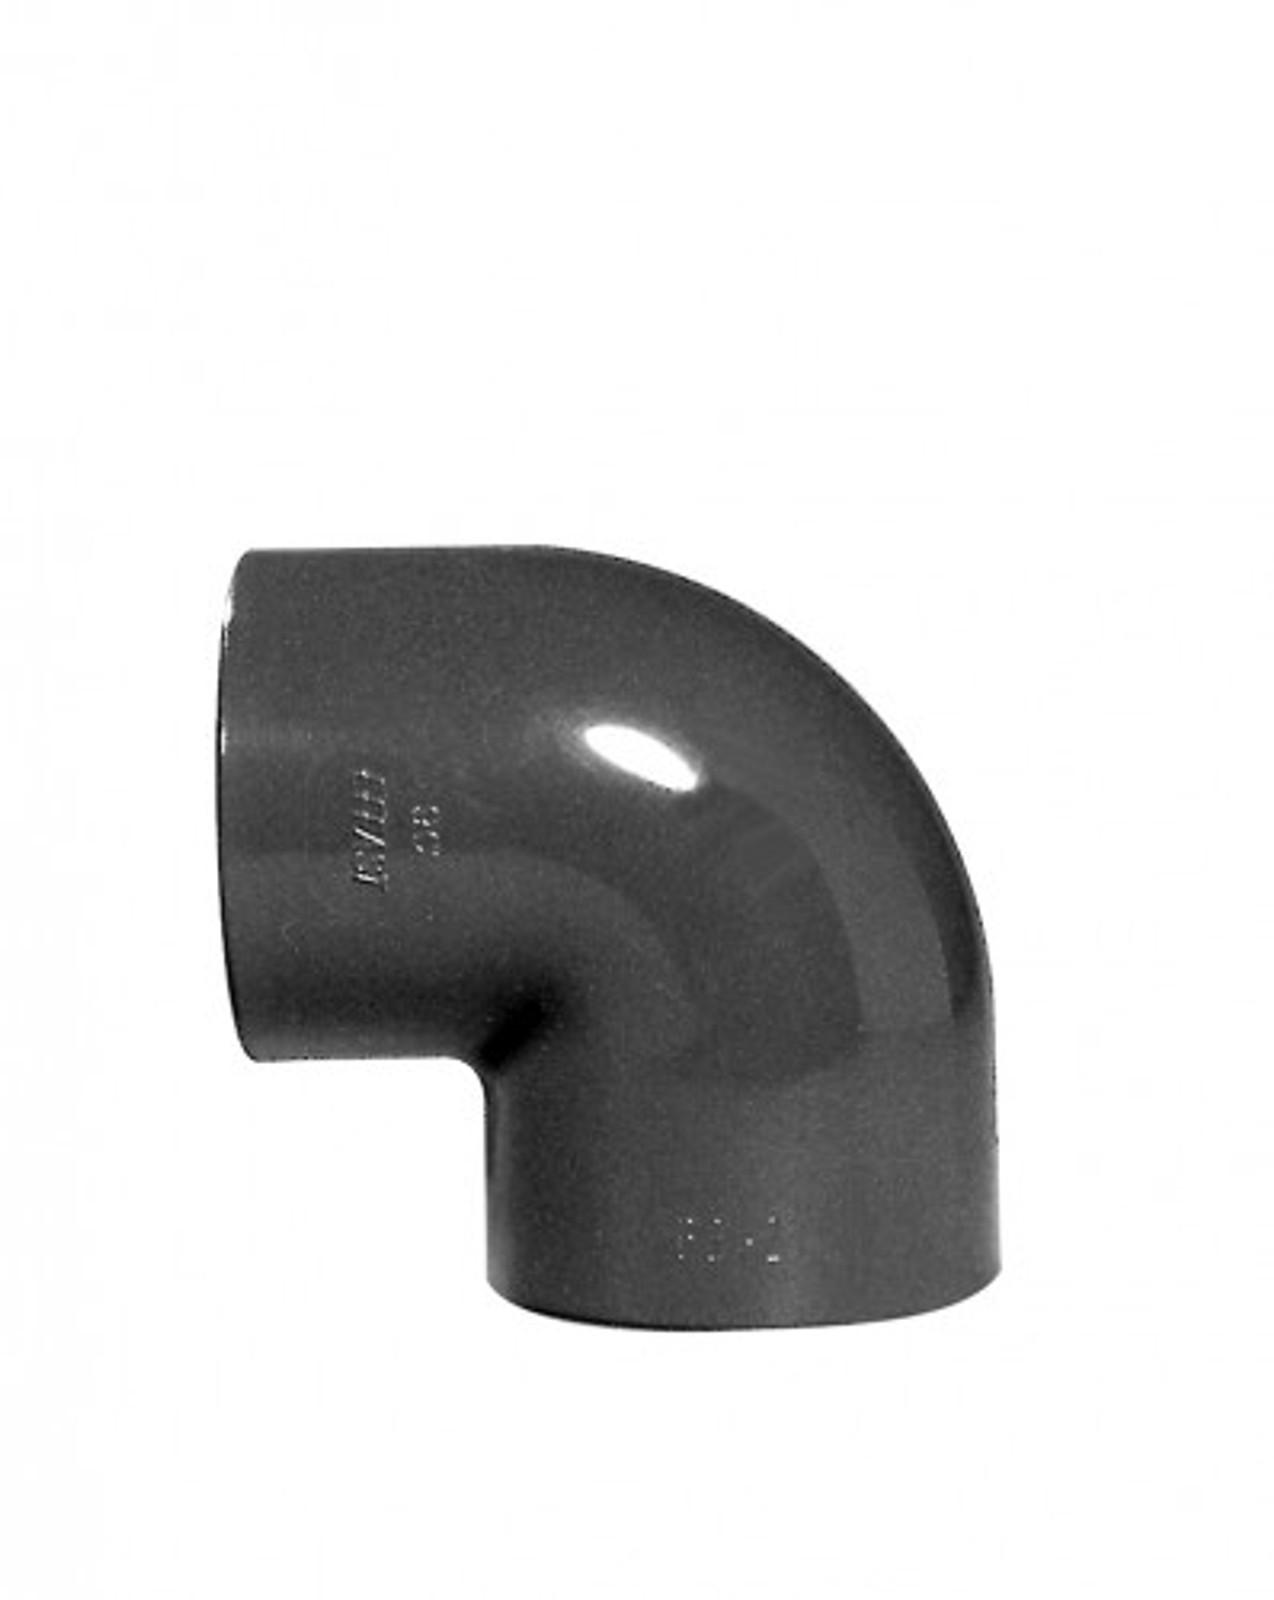 Winkel 90°, 32 mm aus PVC